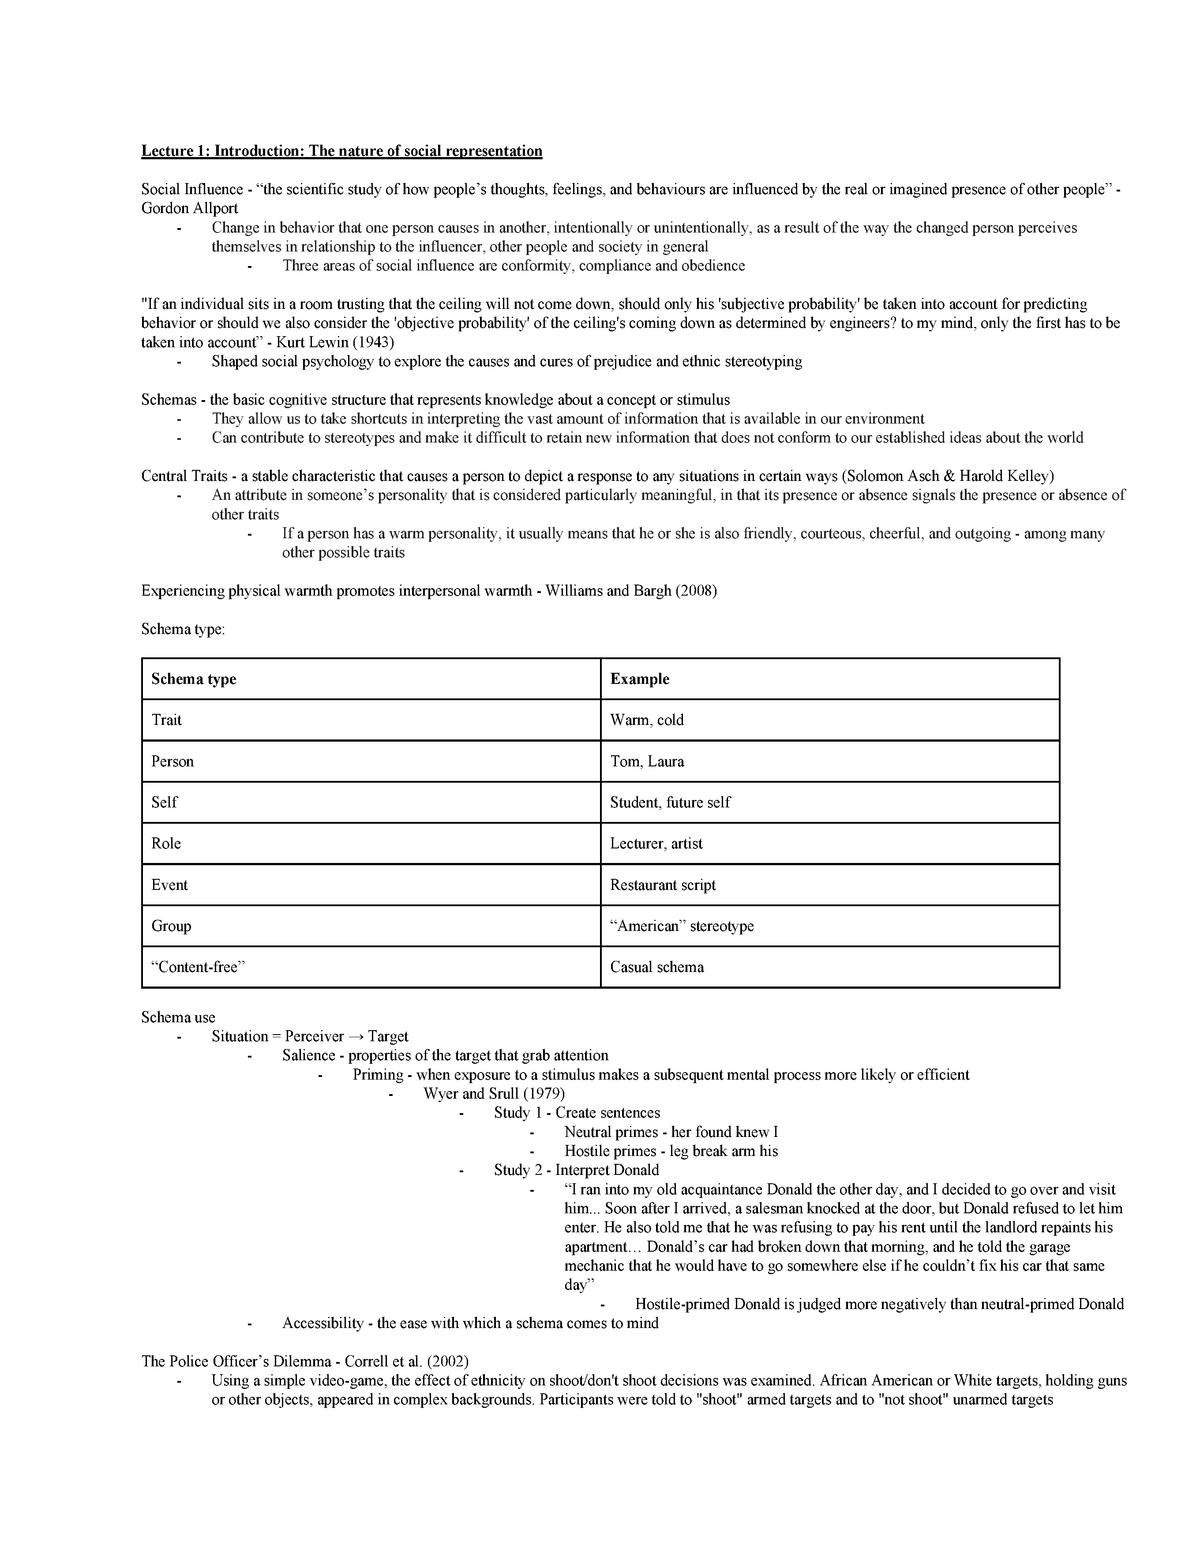 Notes - Social and Applied Psychology PSYC212 - StuDocu